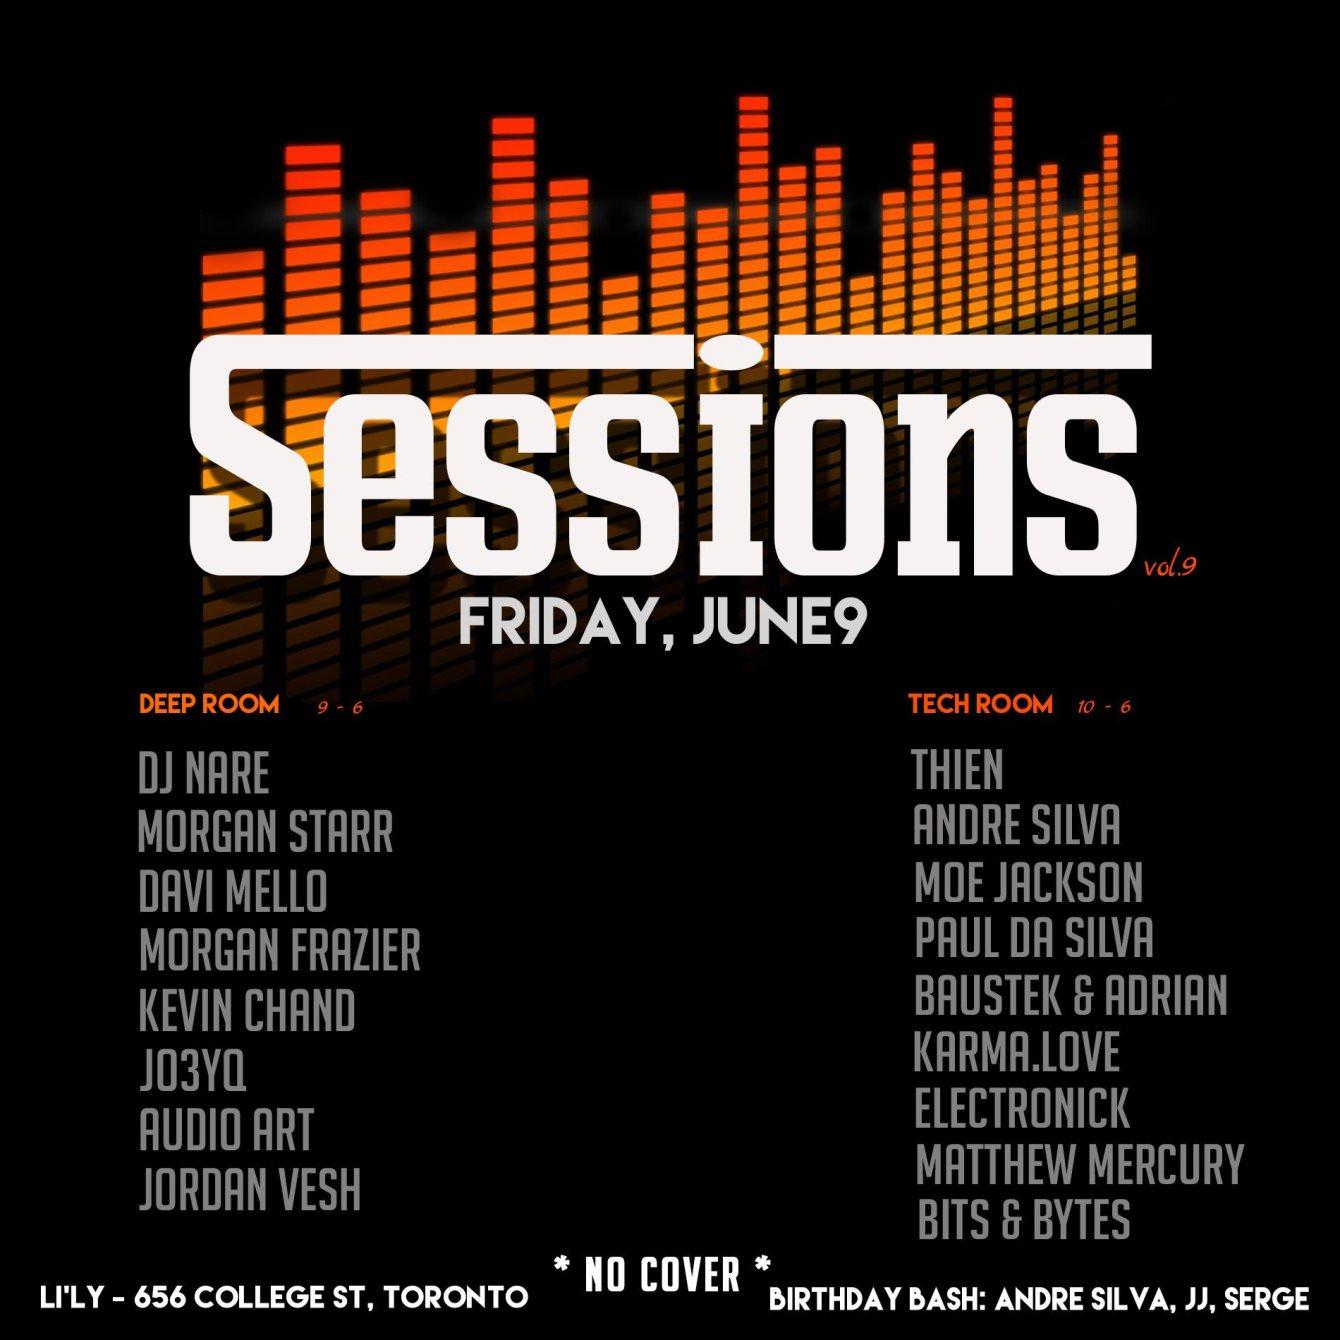 Headless Royalty Free Stock Music Pt2 >> Ra Sessions Vol 9 At Li Ly Resto Lounge Toronto 2017